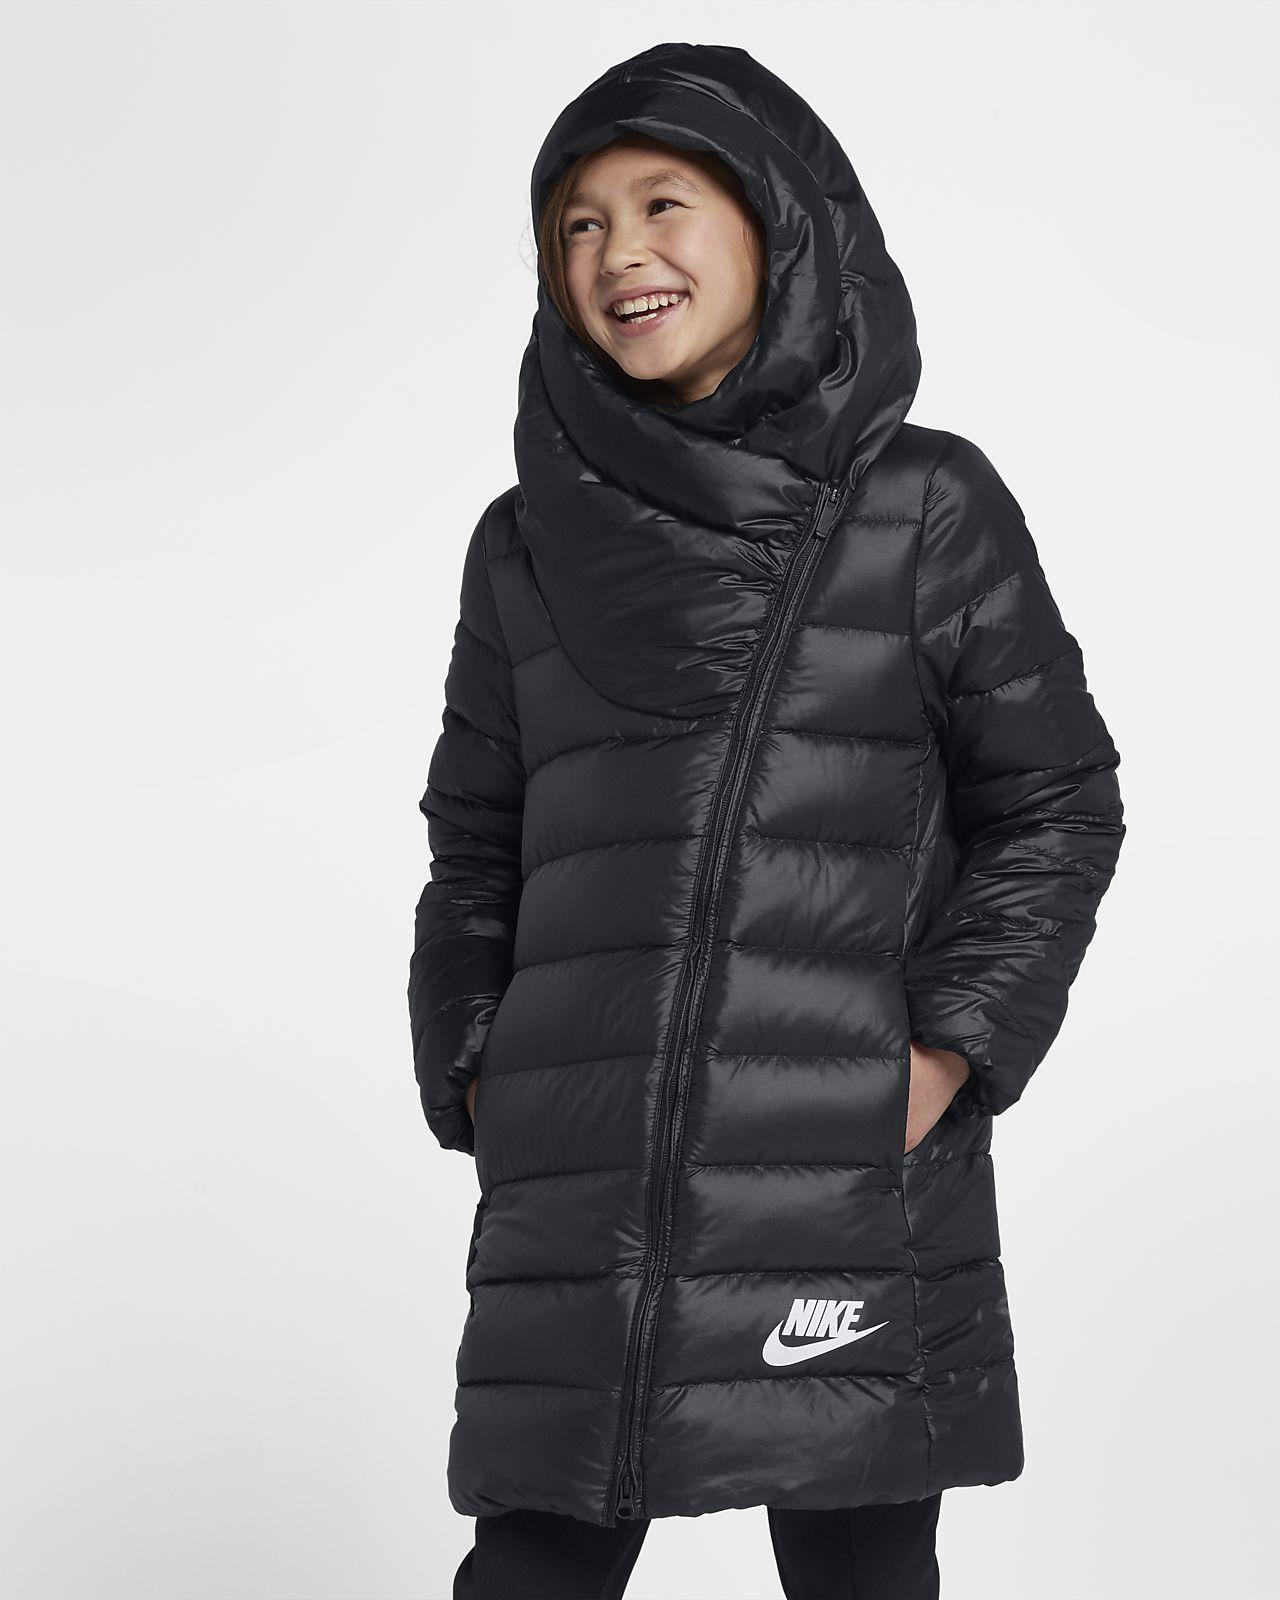 Grande Plumas Para Chaqueta Mx Nike Niñas Talla De Sportswear Zq5HO